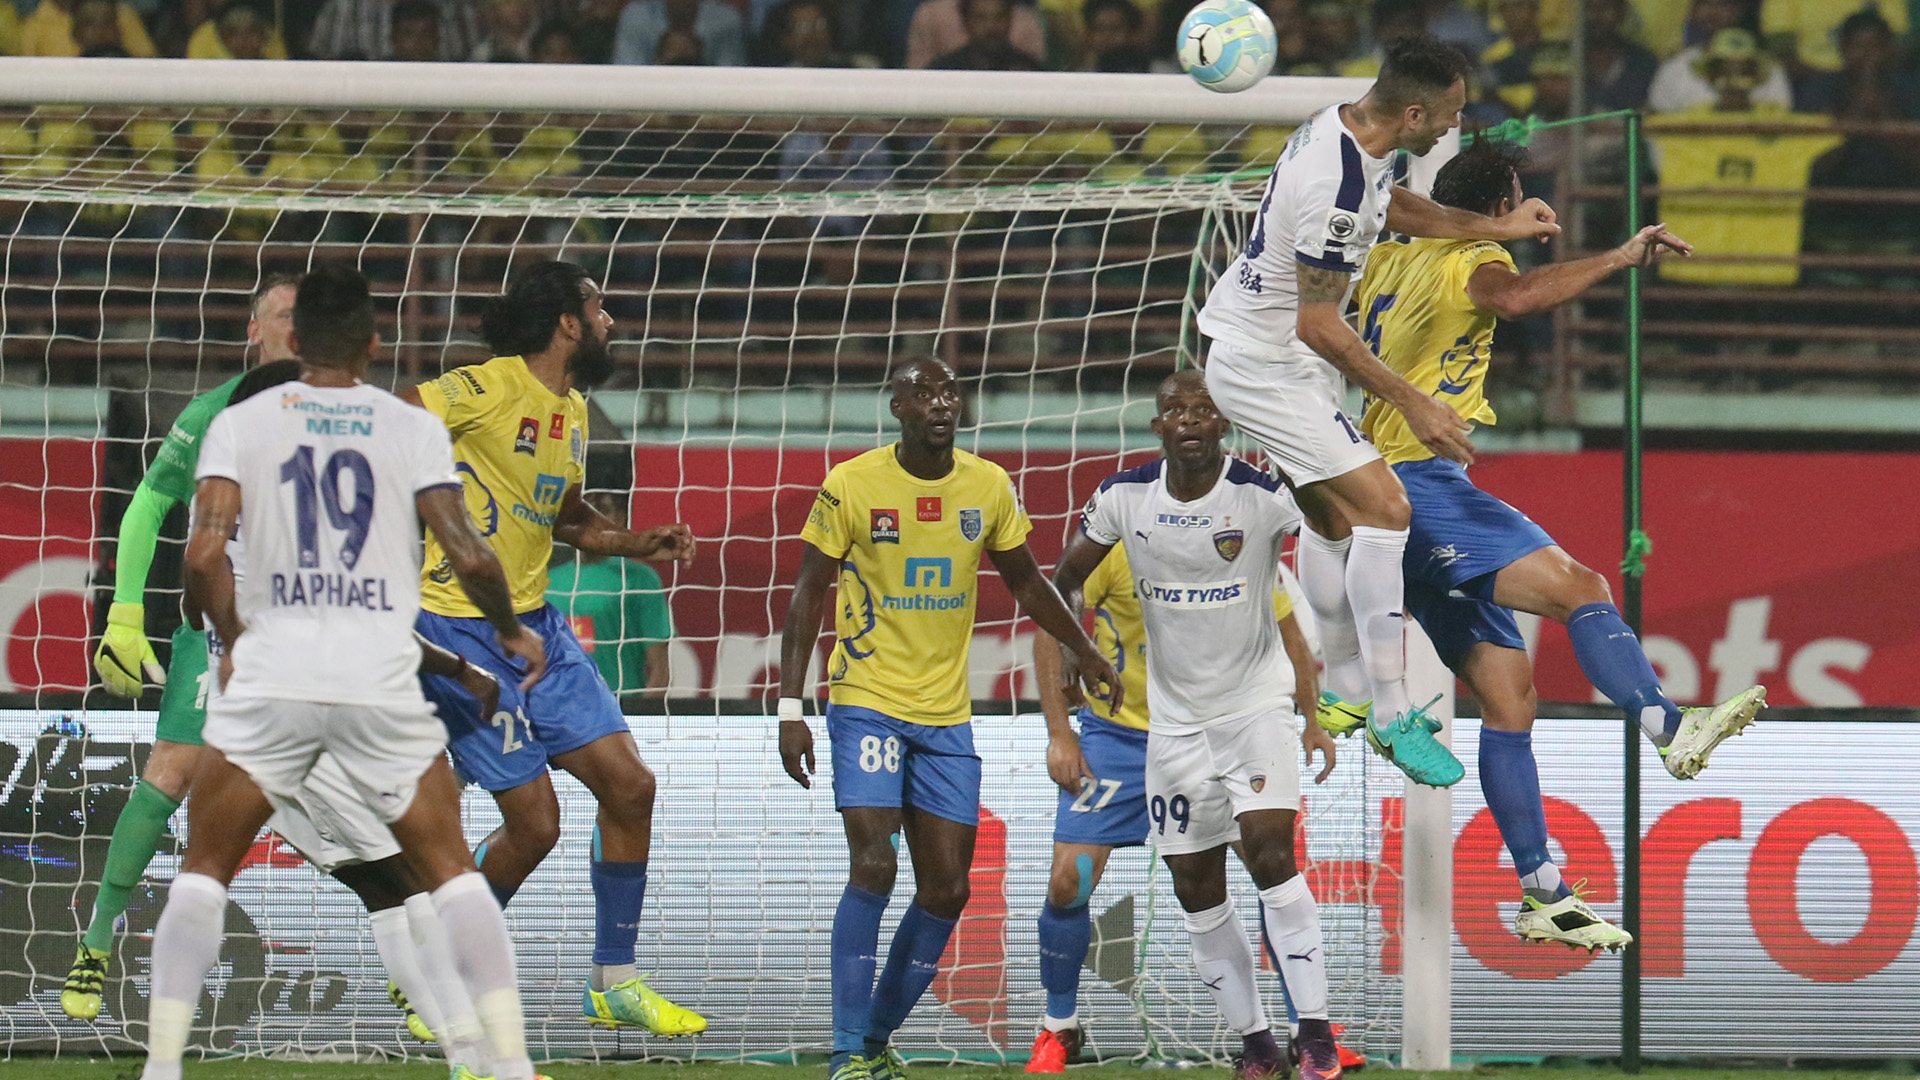 Kerala Blasters FC Chennaiyin FC ISL season 3 2016